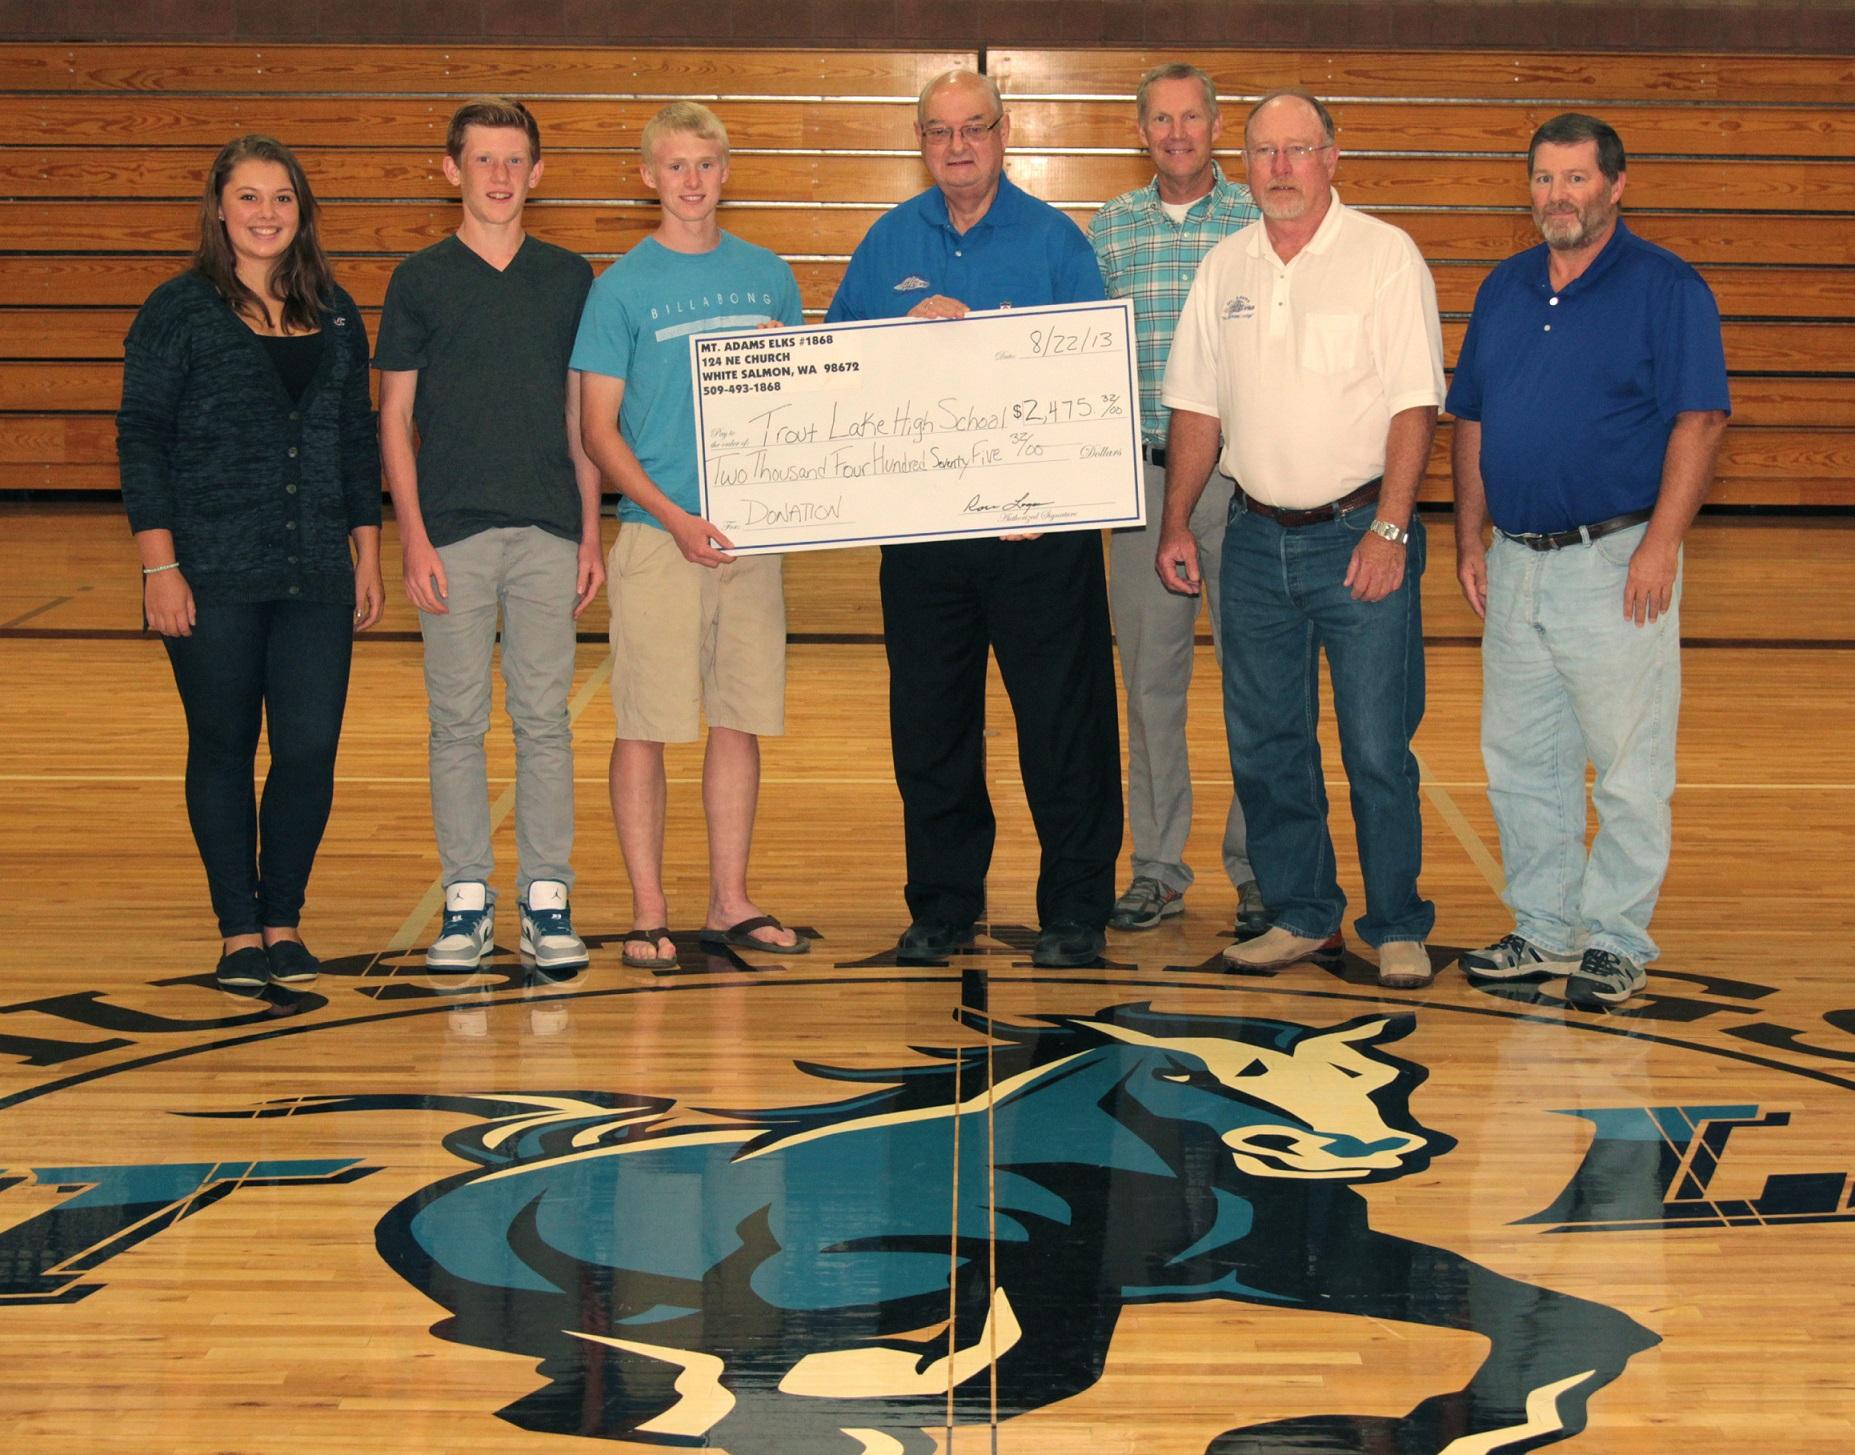 TroutLake High School Donation